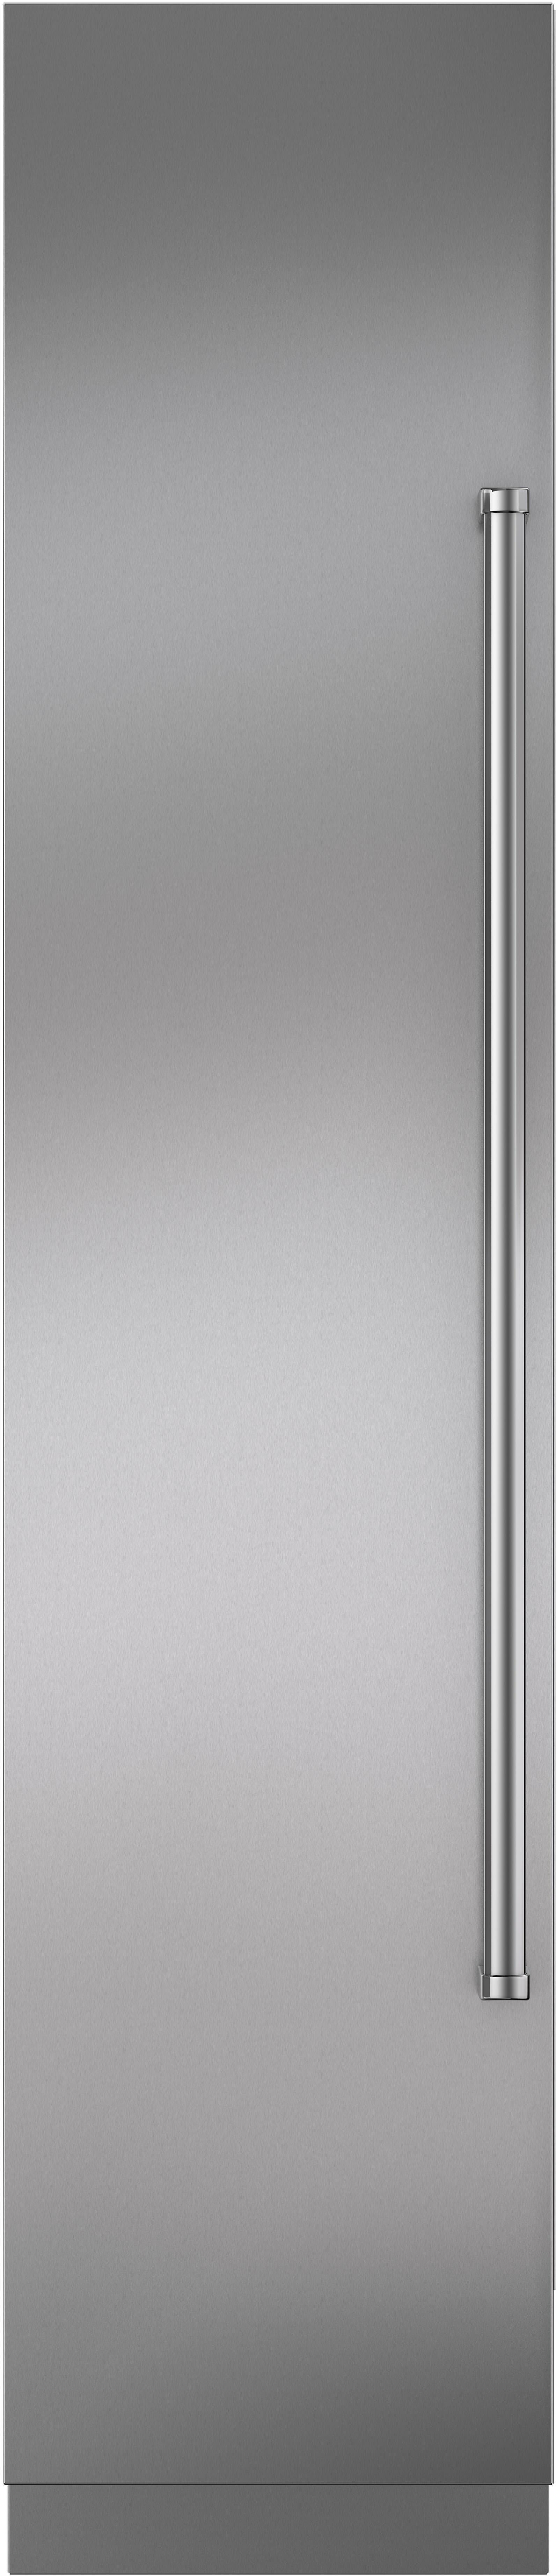 Sub Zero Ic36ridrh 36 Inch Panel Ready Refrigerator Column